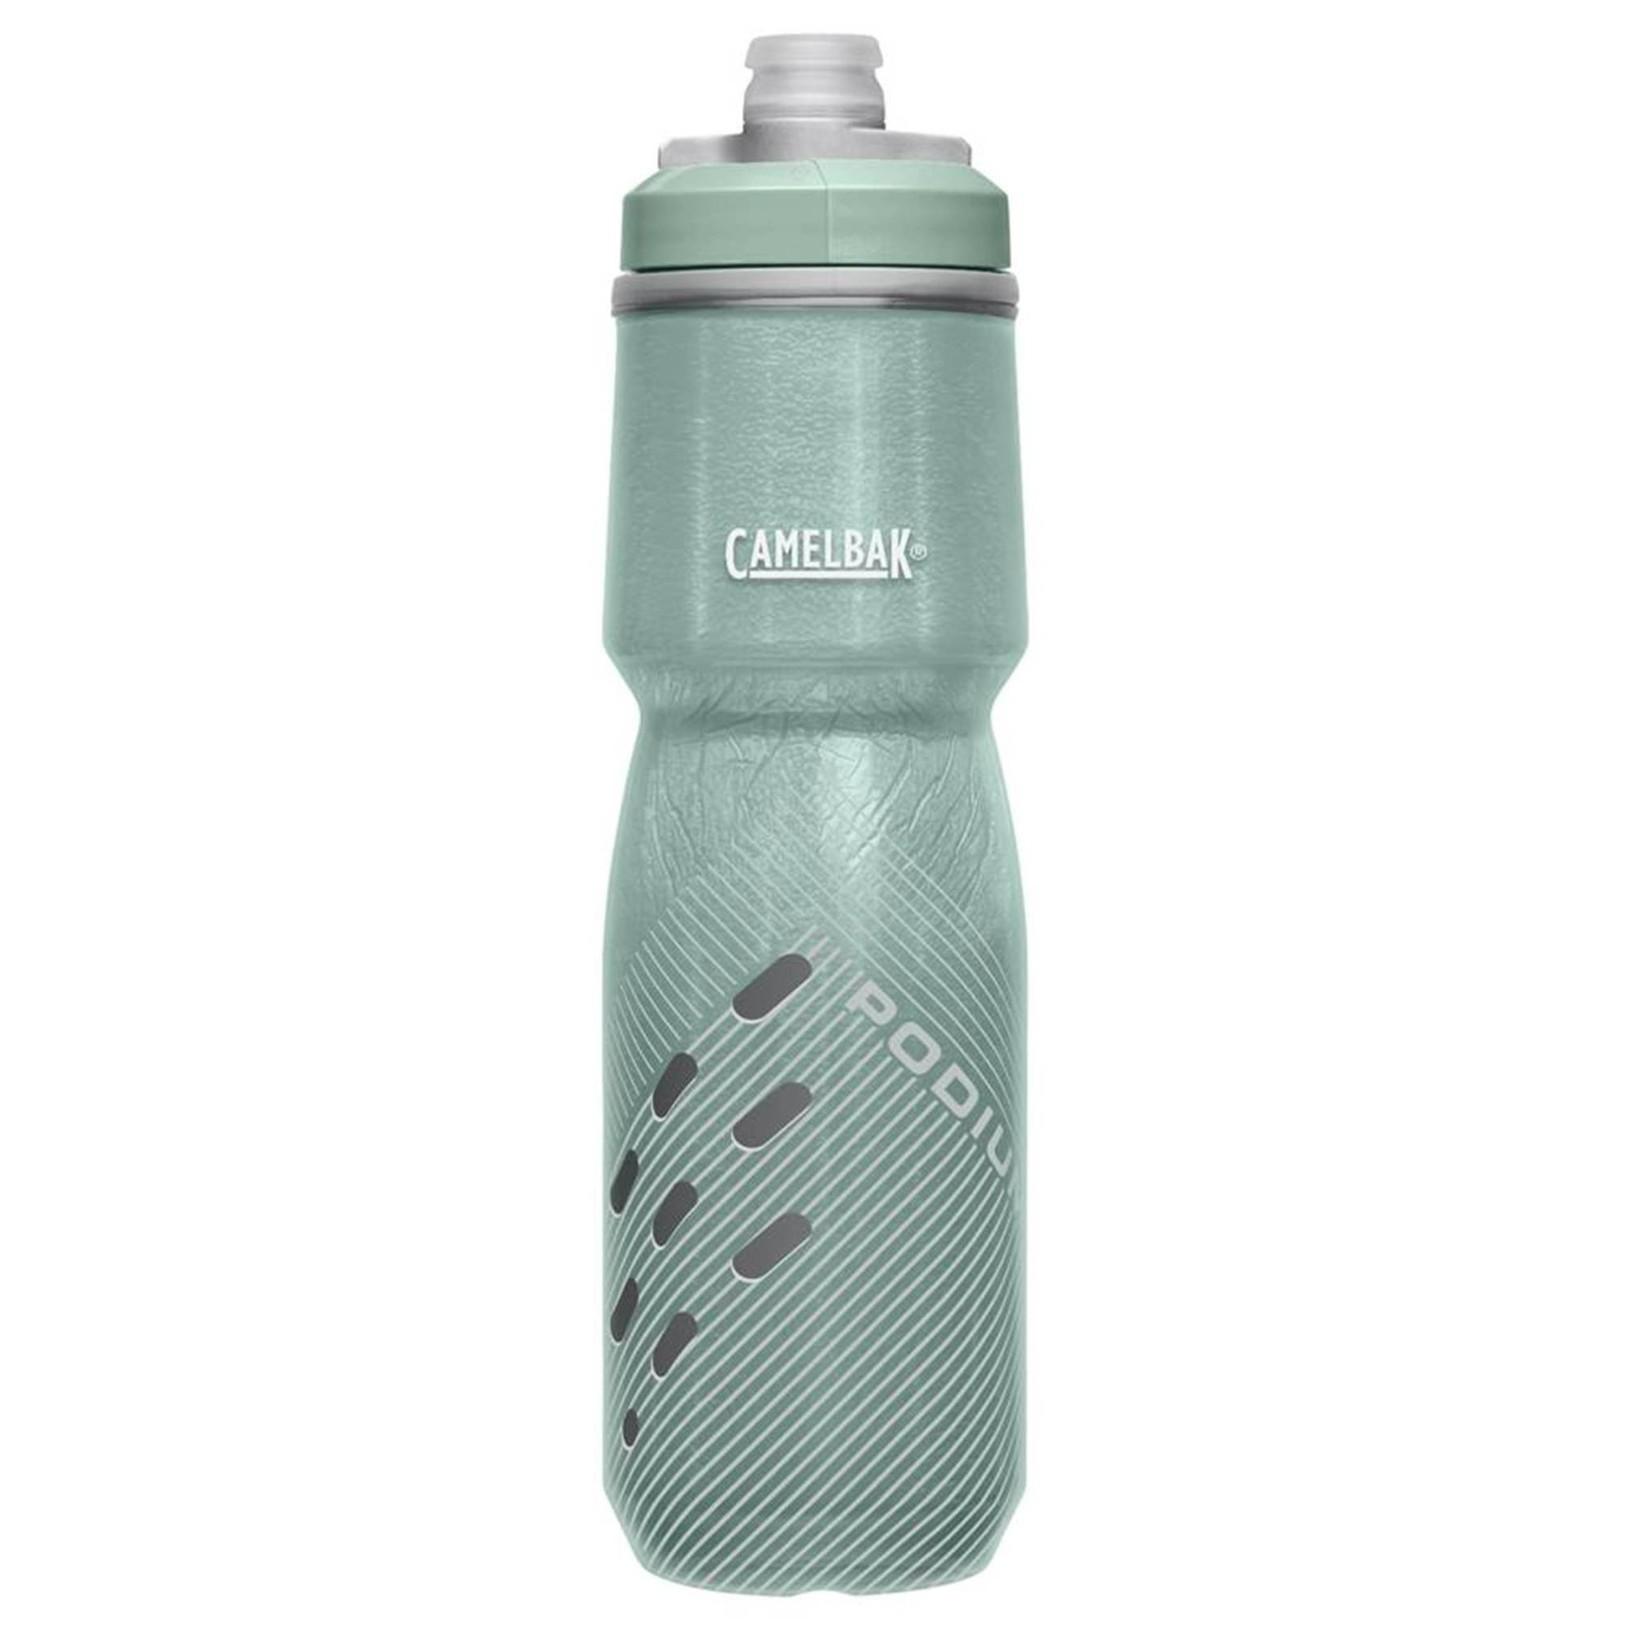 Camelbak Podium Big Chill Water Bottle  Desert Sage 710ml